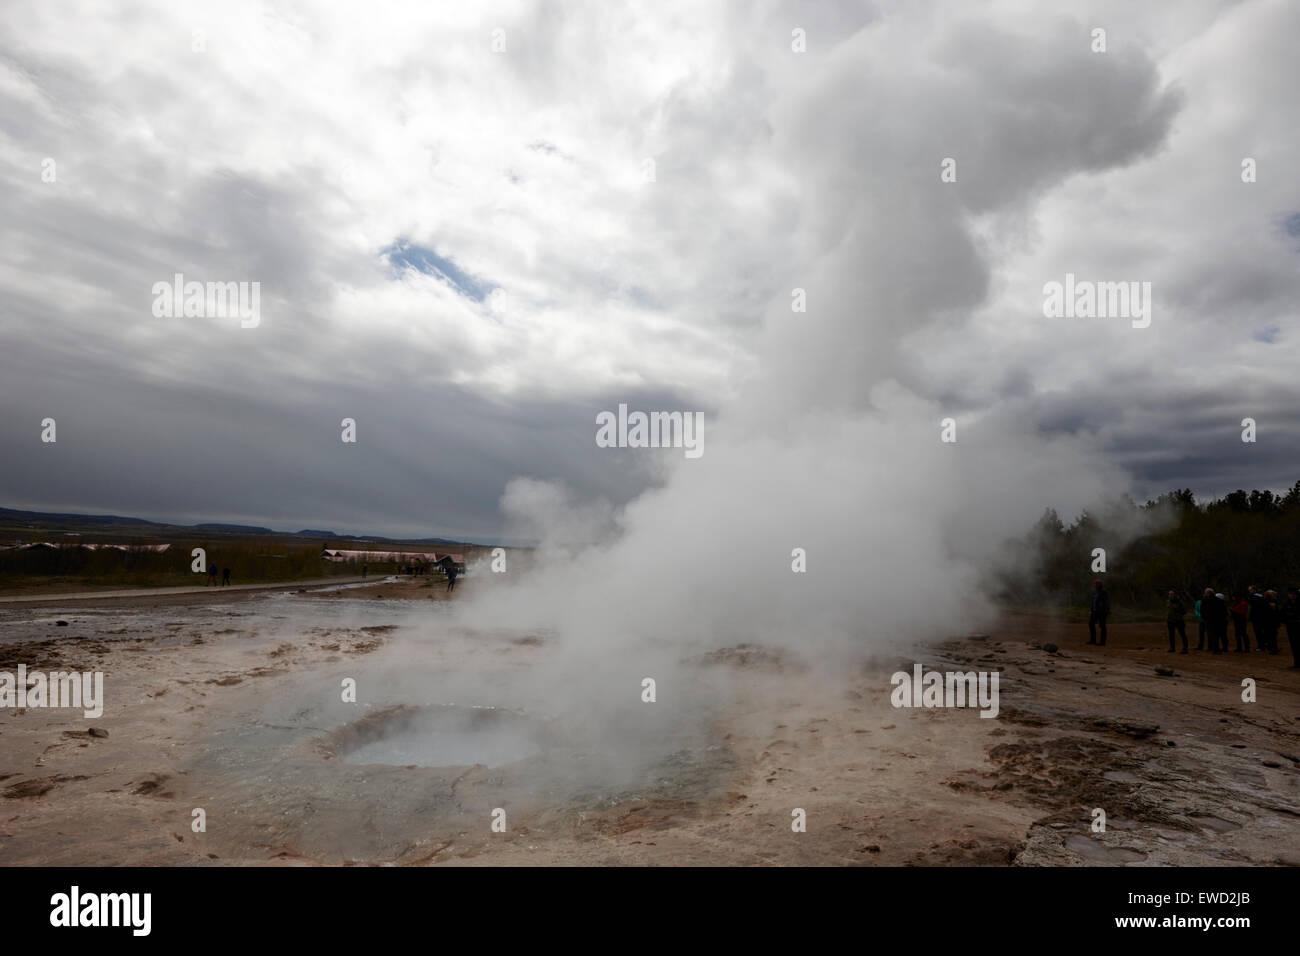 strokkur geyser erupting at geyser geothermal site Geysir Iceland - Stock Image